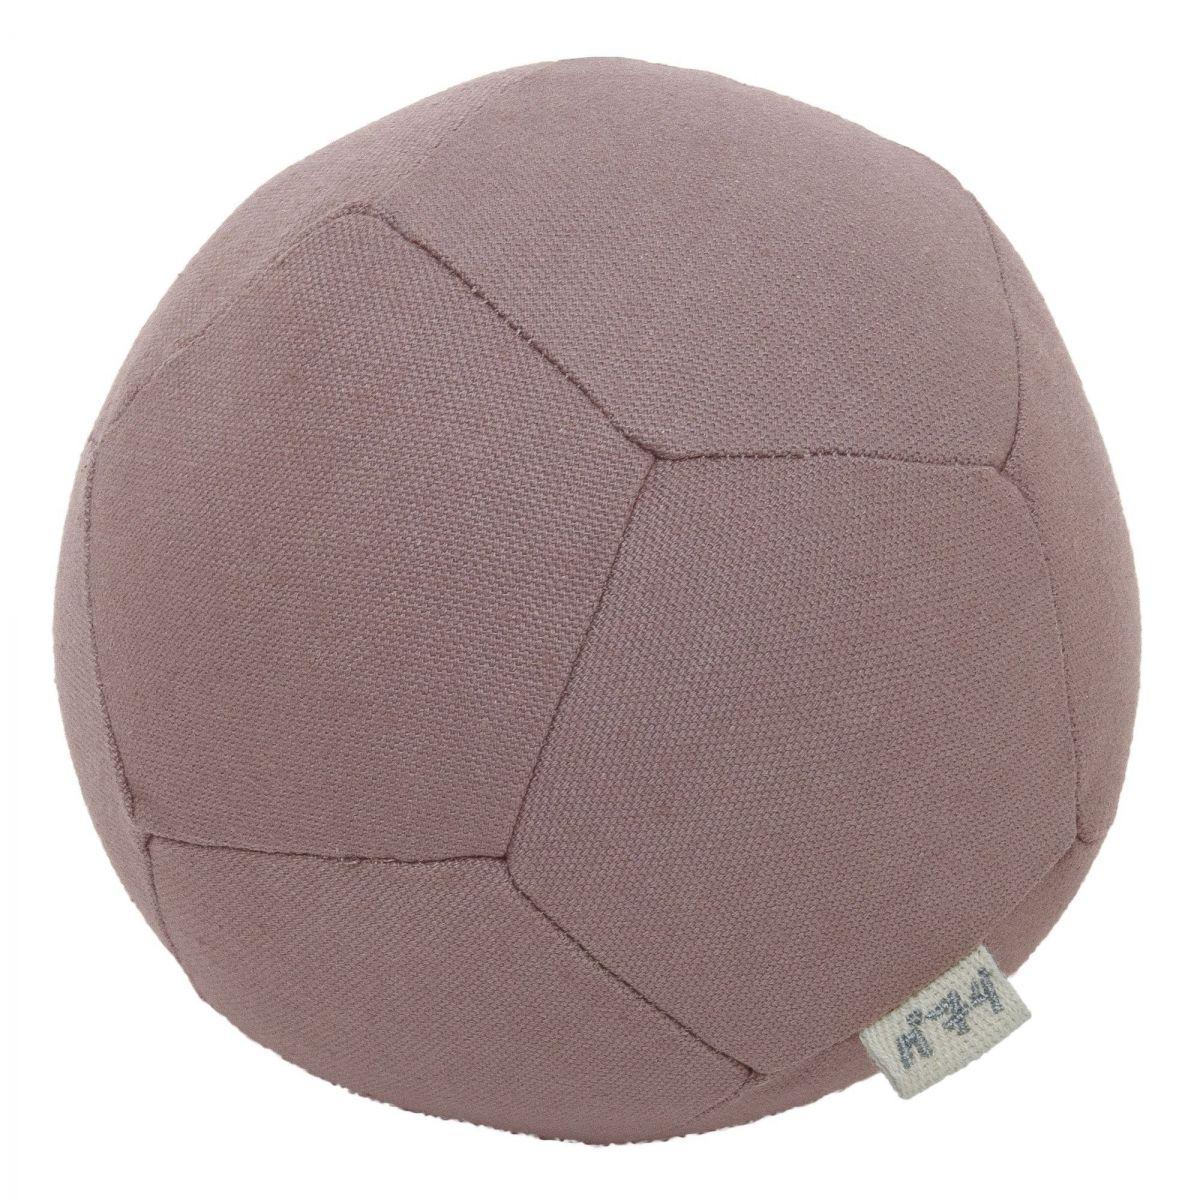 Numero 74 - Pentagone Ball dusty pink - 1